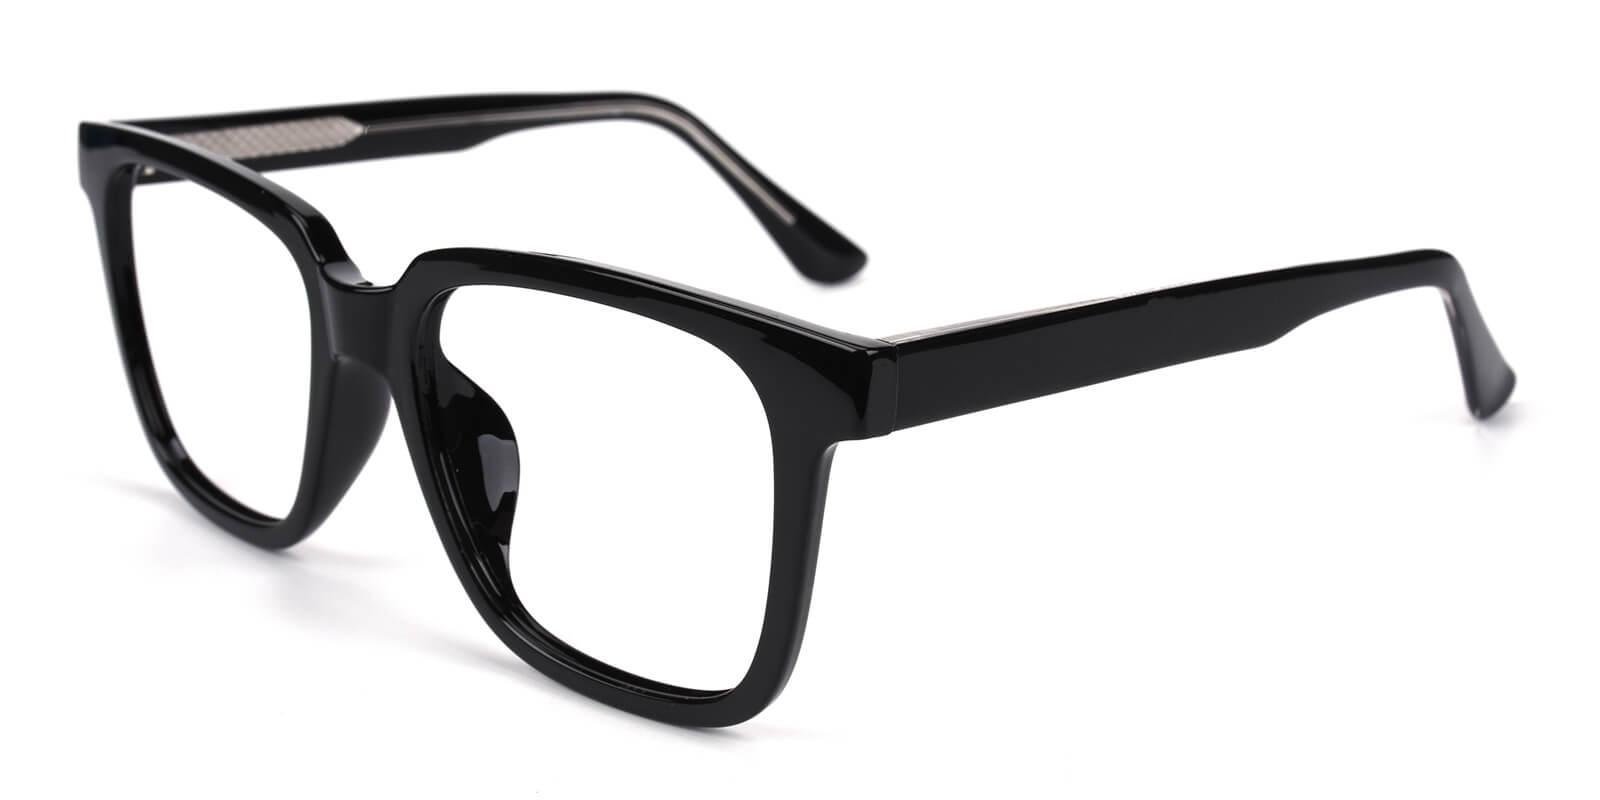 Jadeite-Black-Square-Acetate-Eyeglasses-additional1